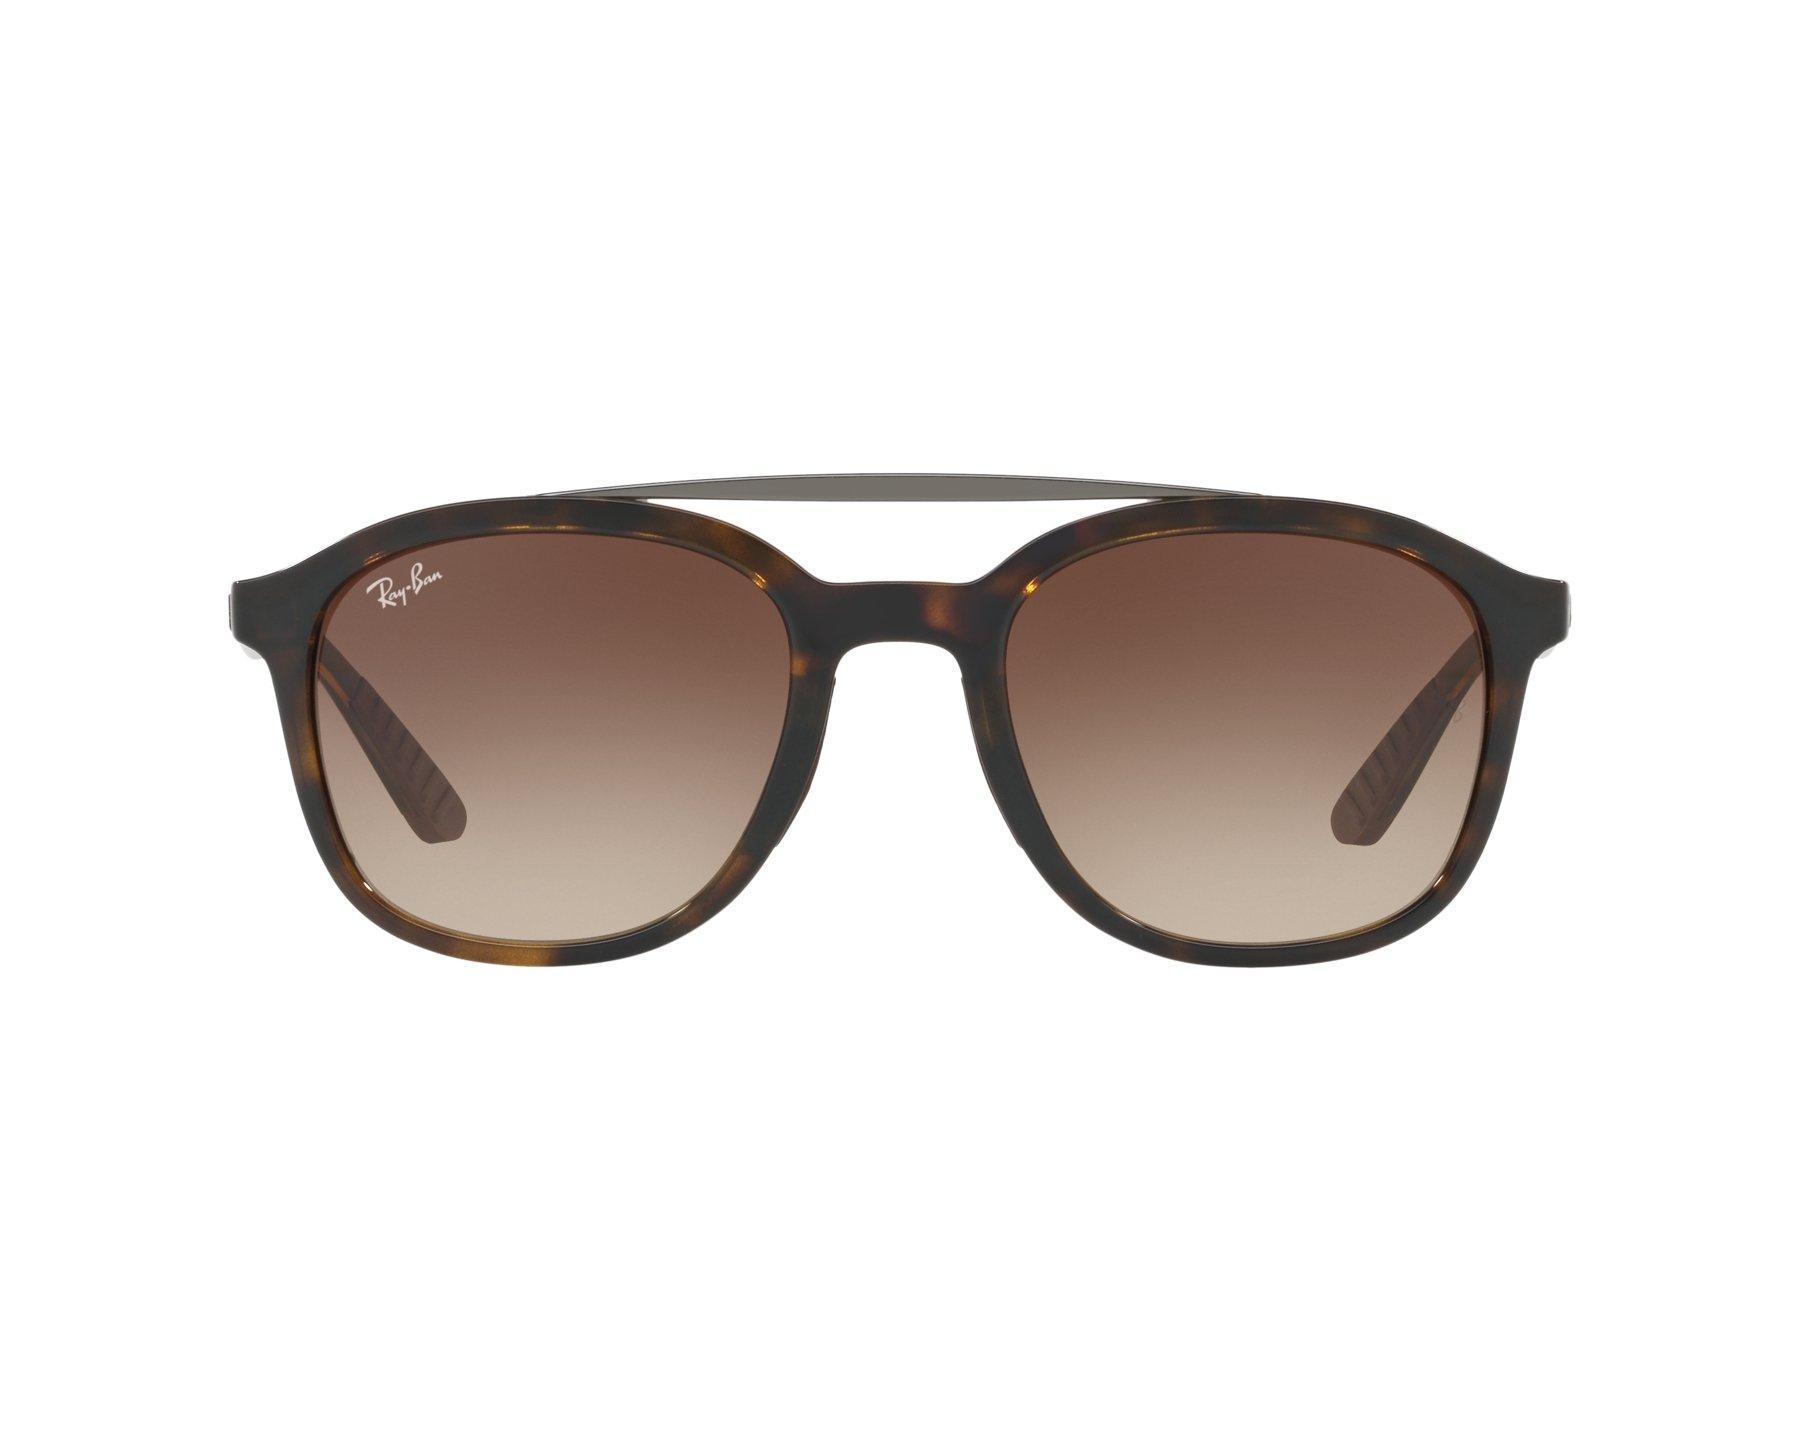 Sonnenbrillen RAY BAN rb4290 710 13